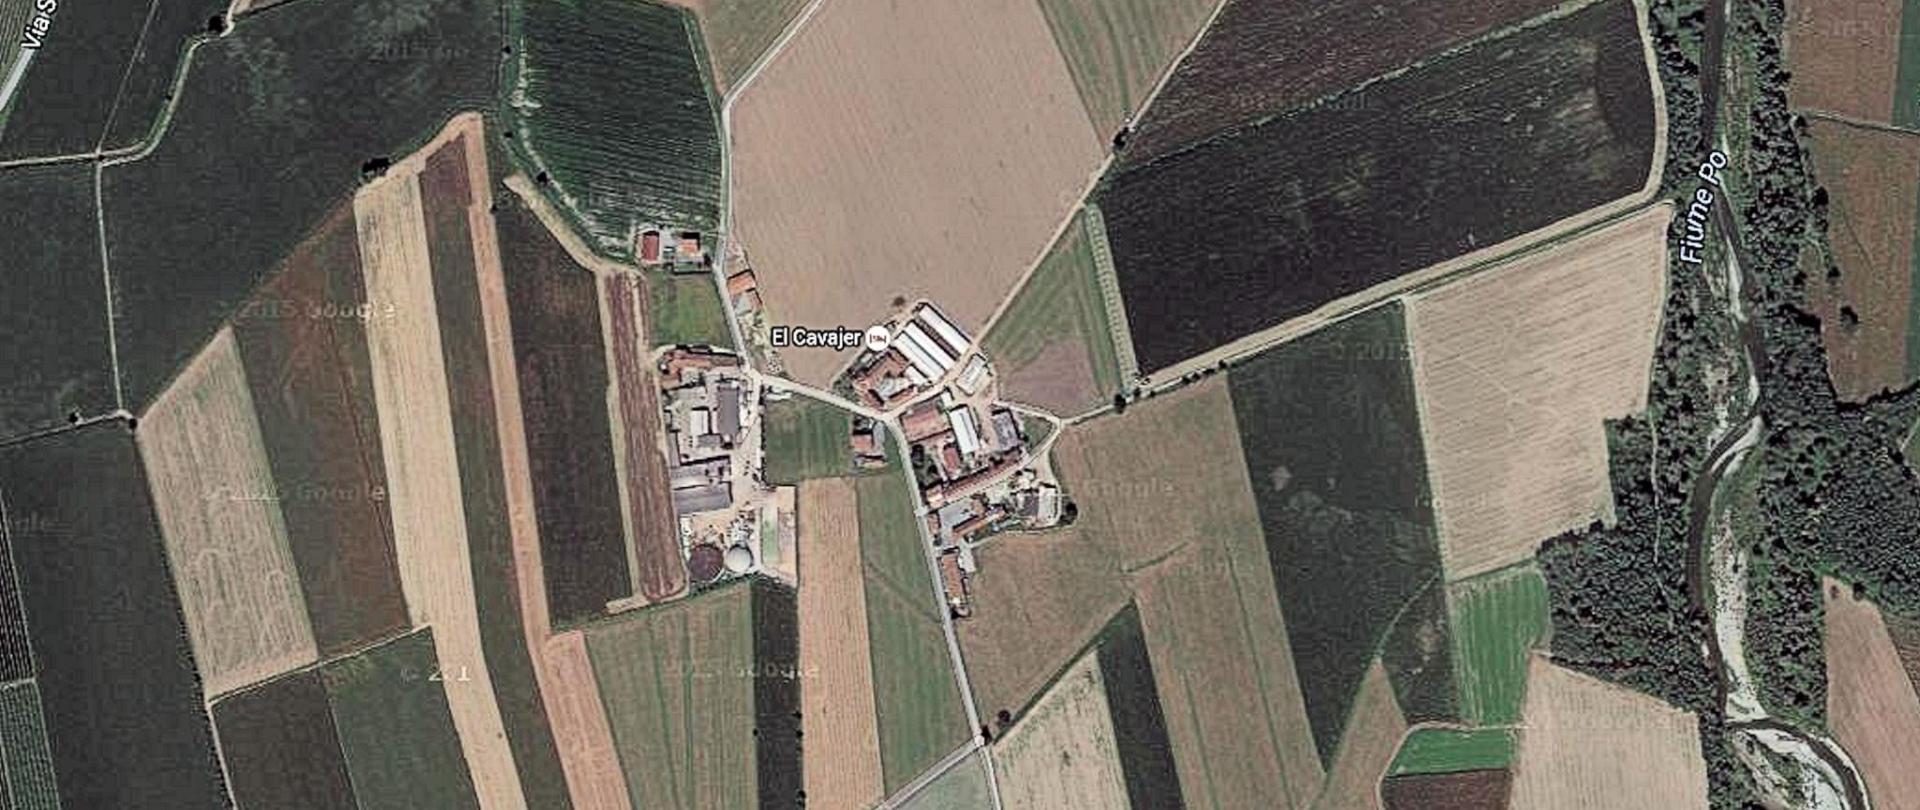 2_Google Maps.jpg